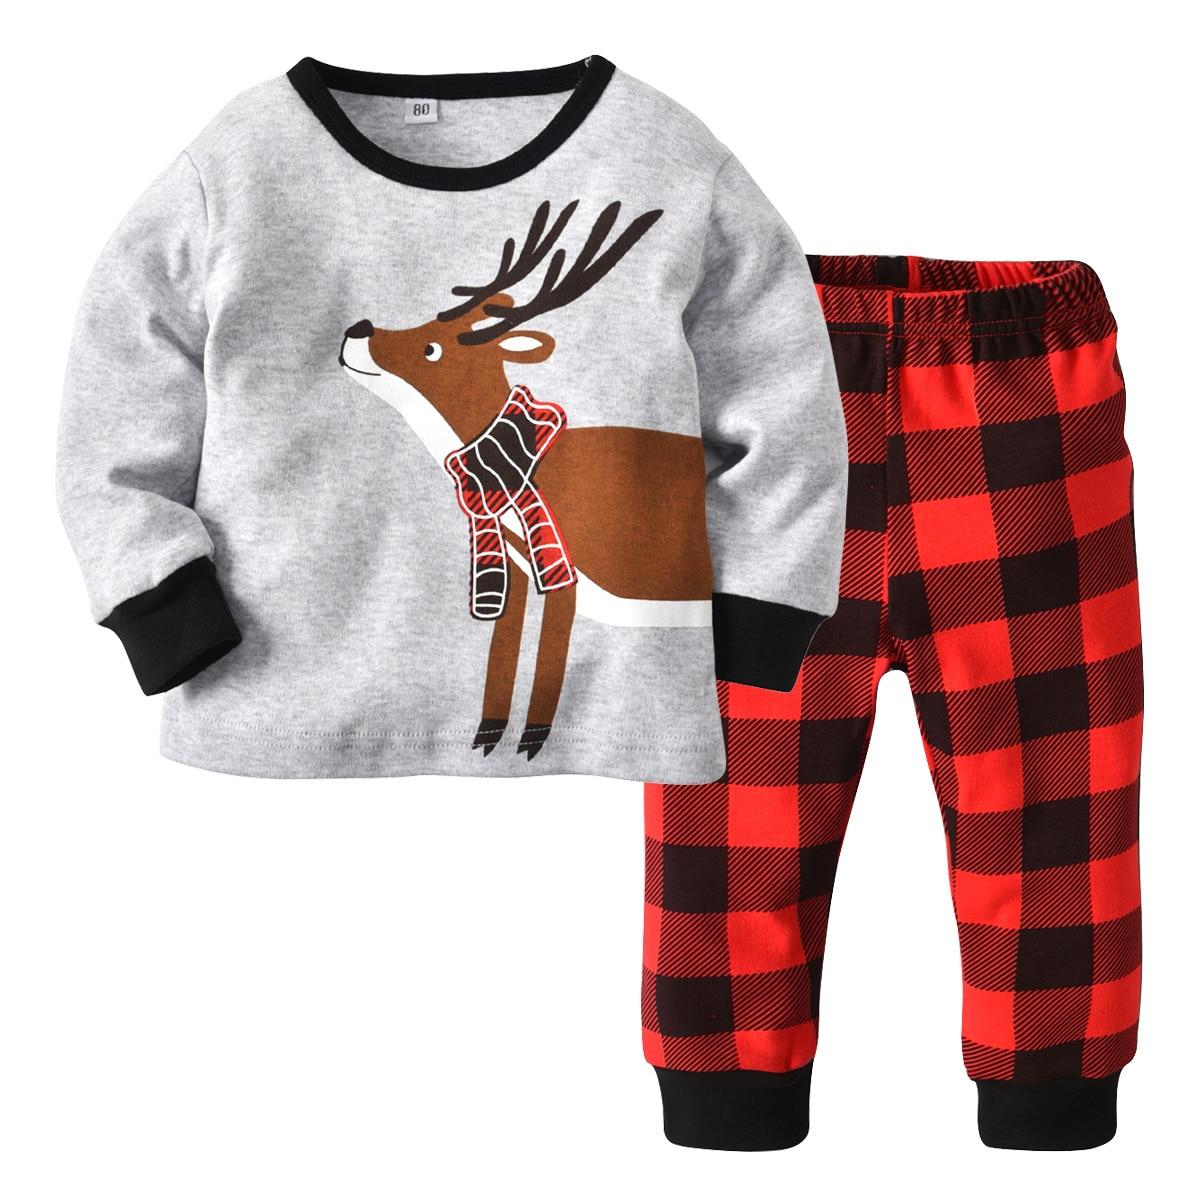 Baby Home Wear Cartoon Kids Pajama Set Children Sleepwear Boys ...